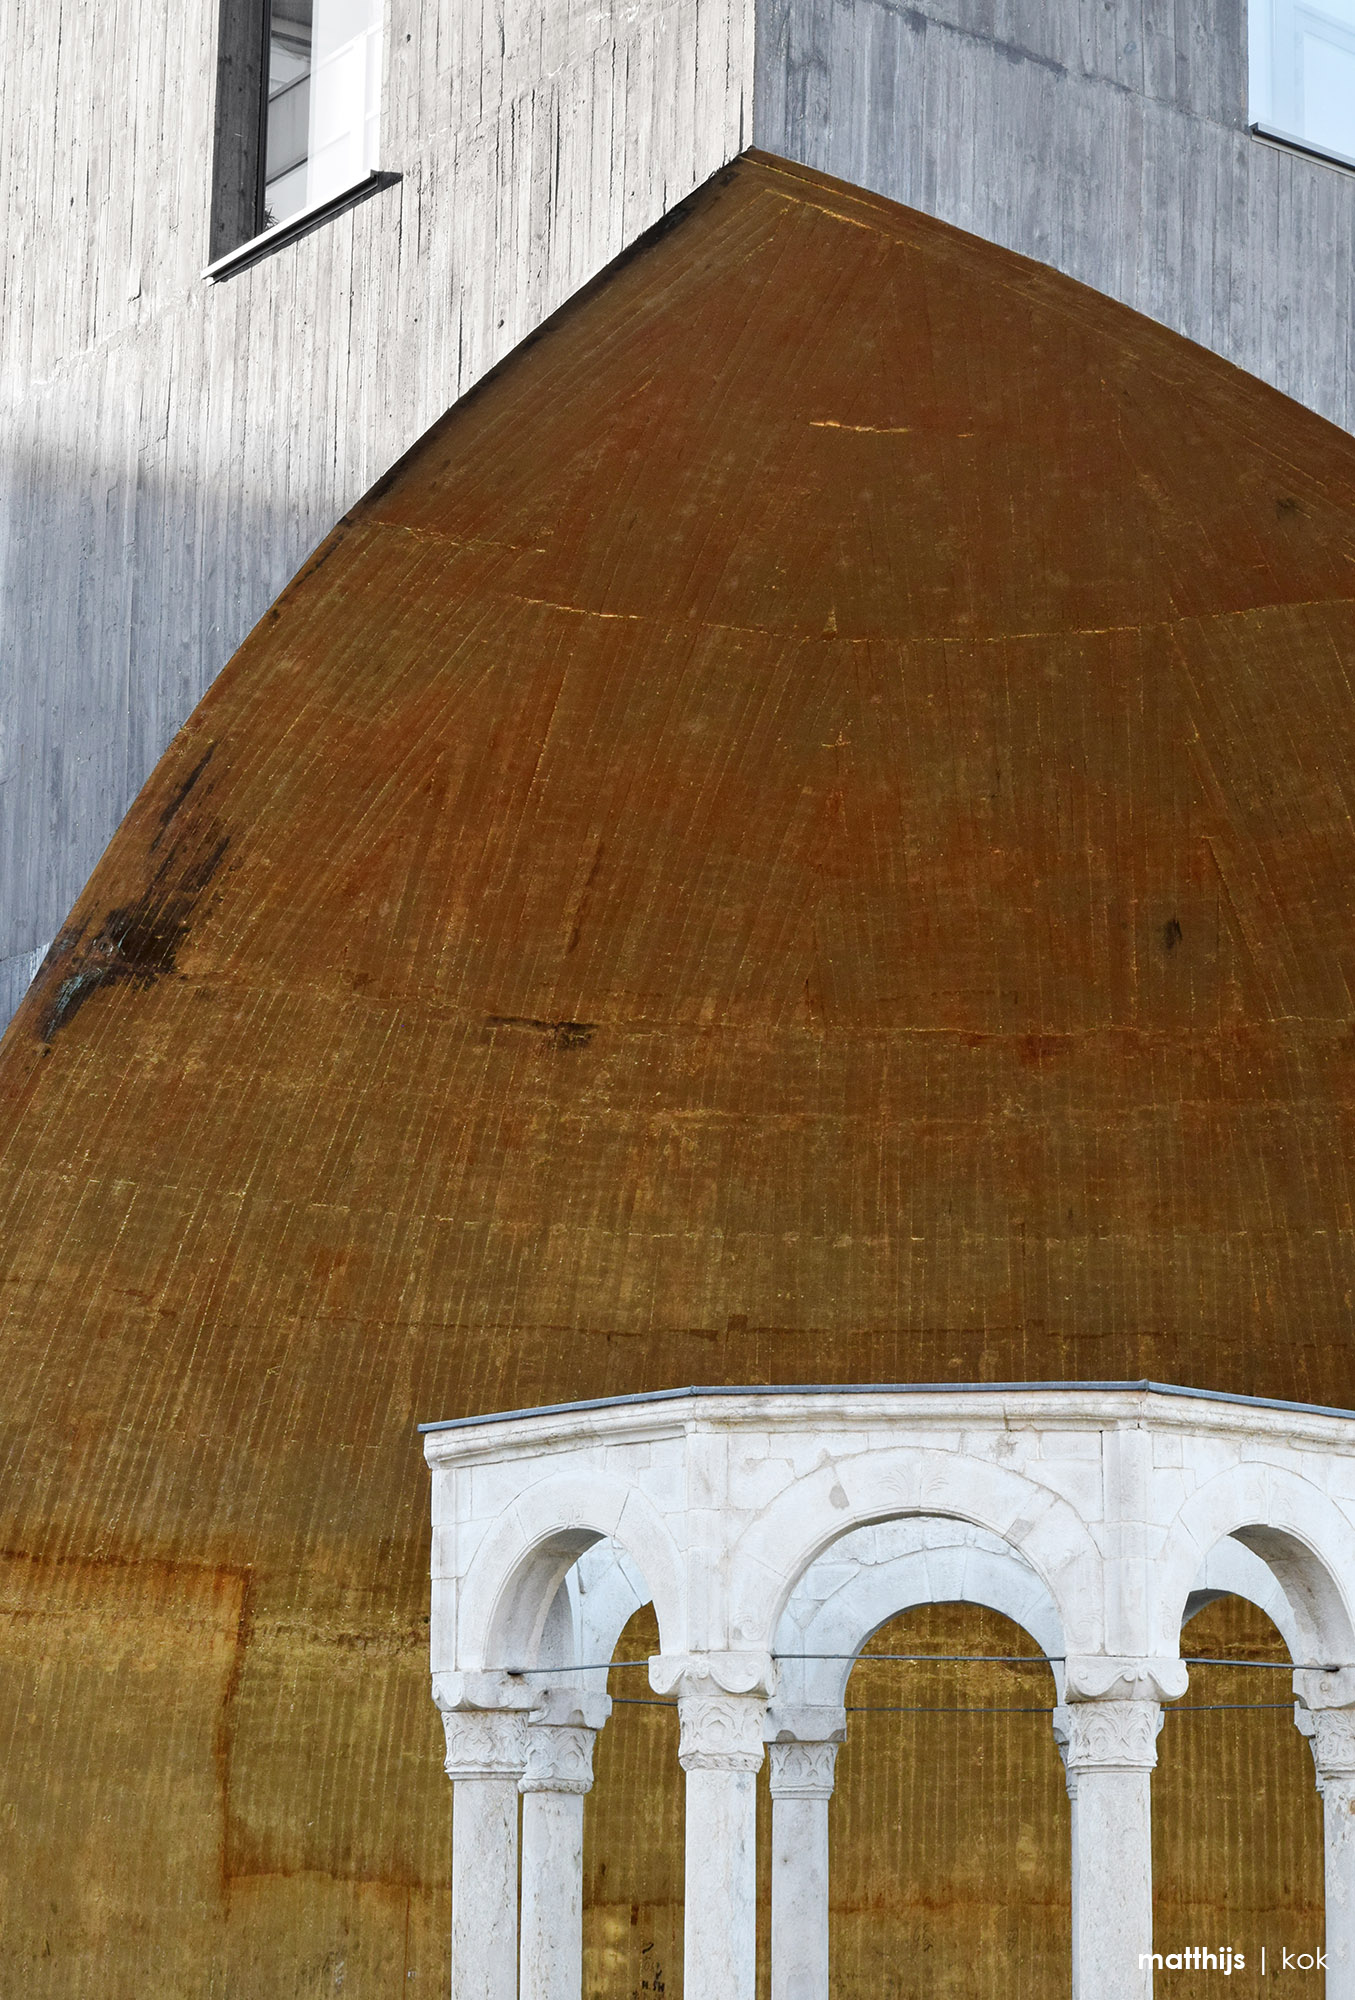 Kapllan Pasha Tomb, Tirana, Albania   Photo by Matthijs Kok